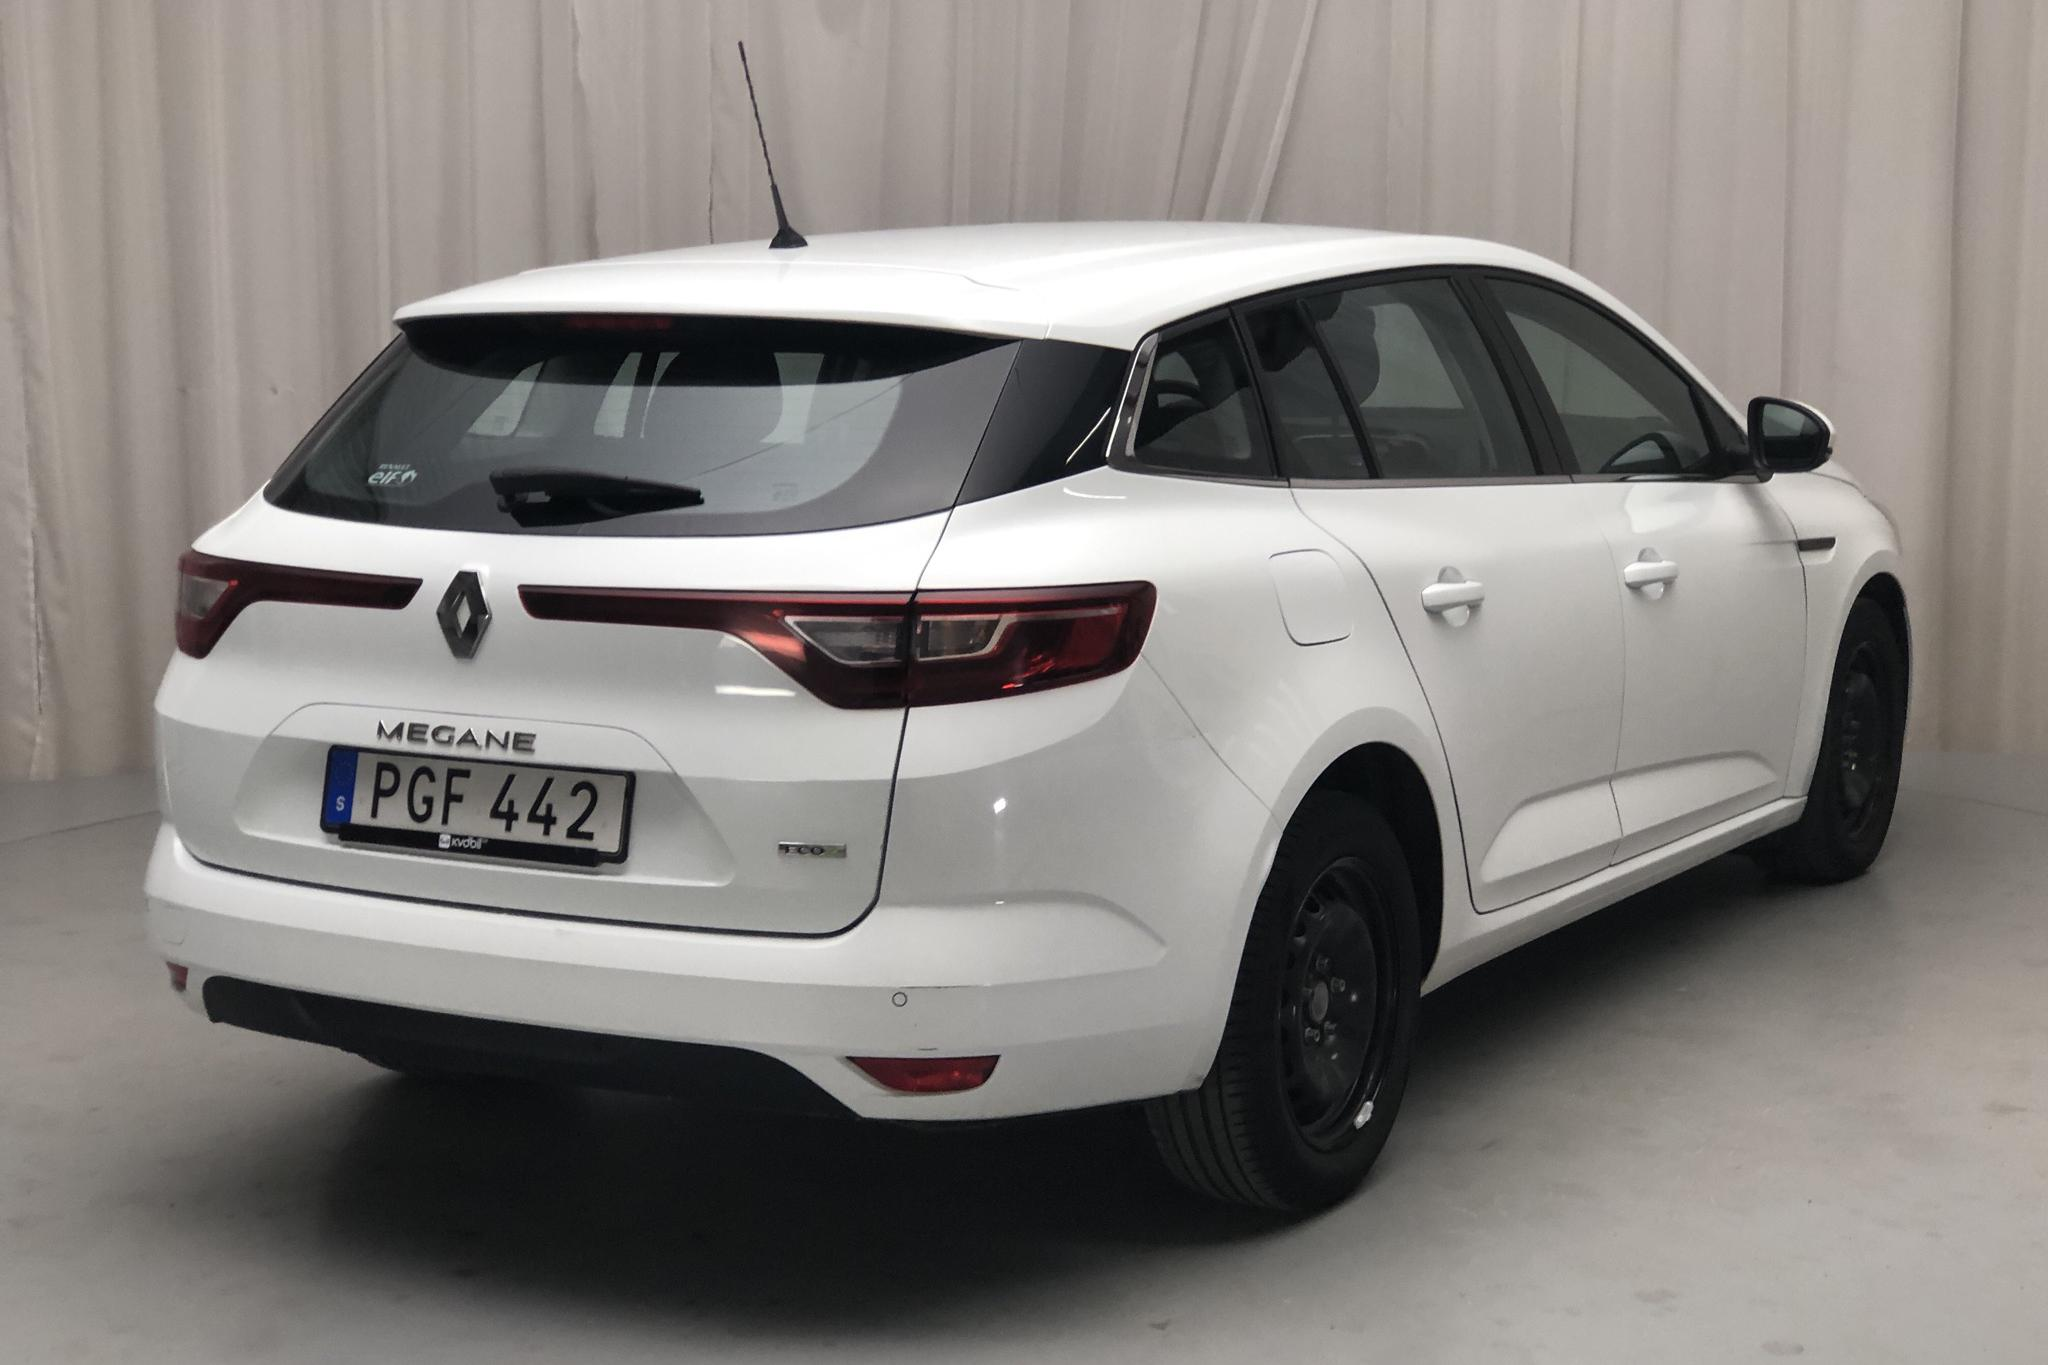 Renault Mégane 1.5 dCi Sport Tourer (110hk) - 115 850 km - Manual - white - 2017